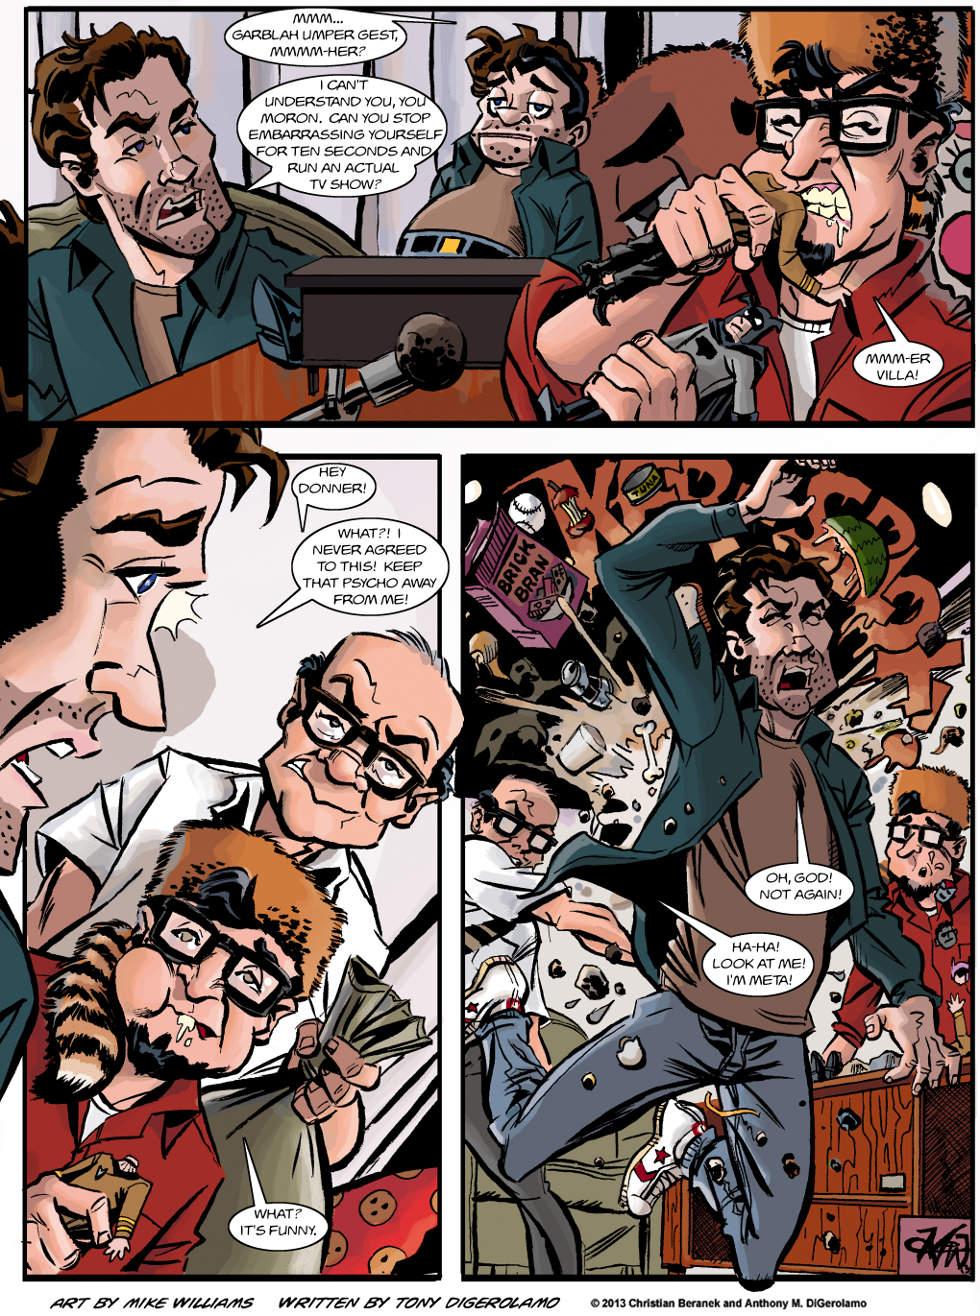 Miserable Comedians:  The Comic's Revenge